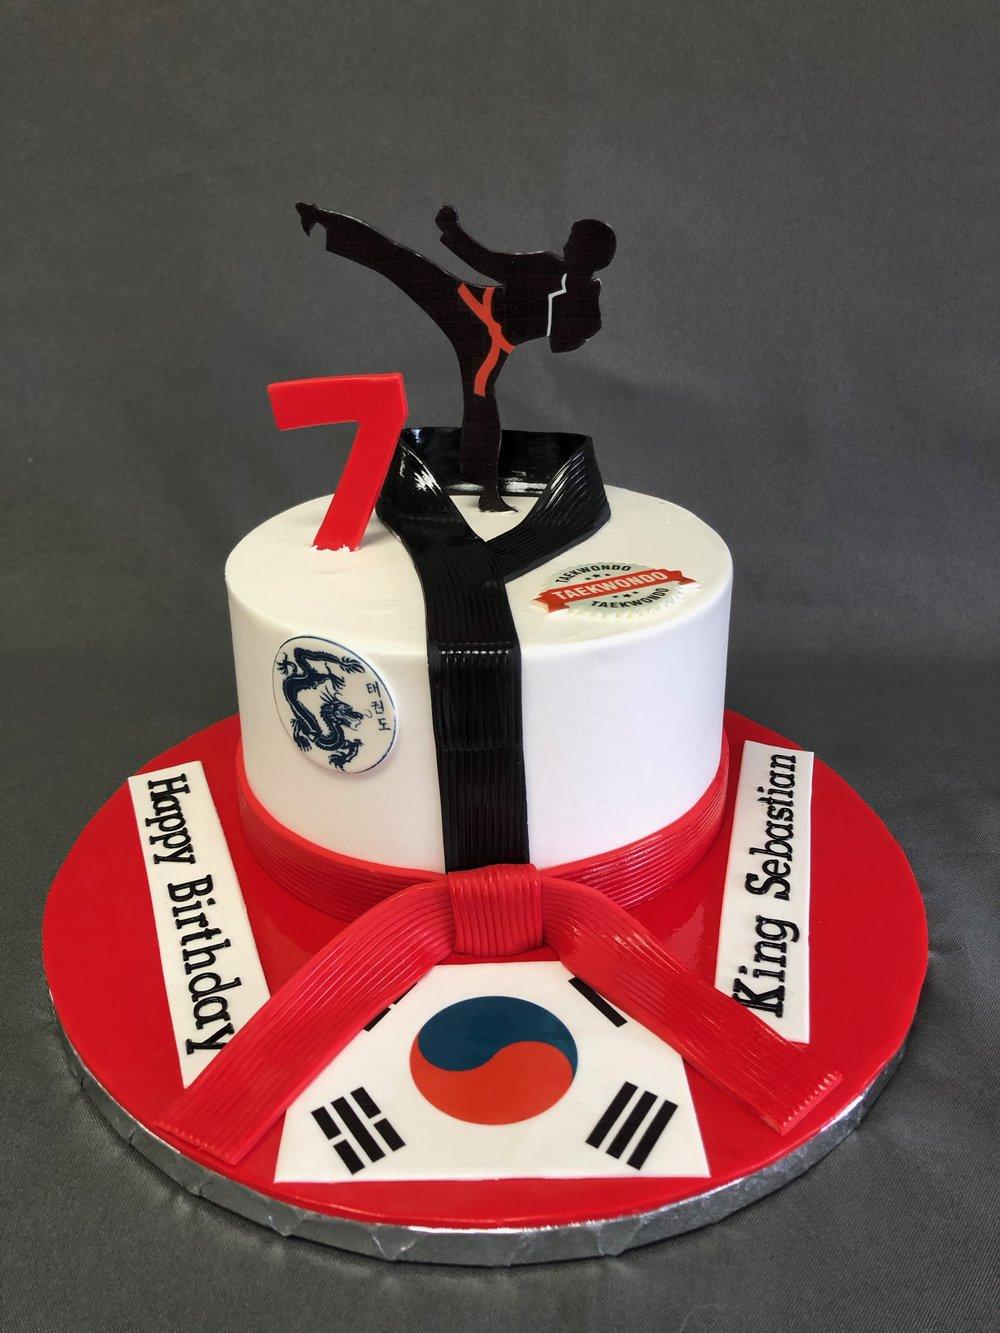 Taekwondo Birthday Cake NJ